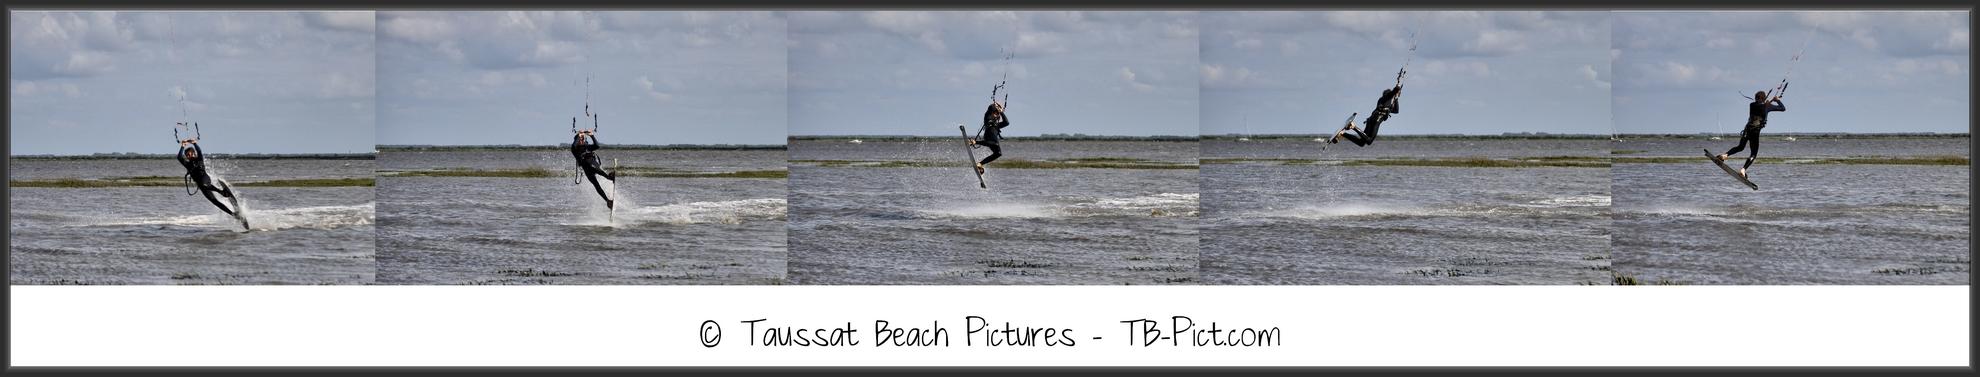 kitesurf back roll back loop rafale séquence saut jump transition